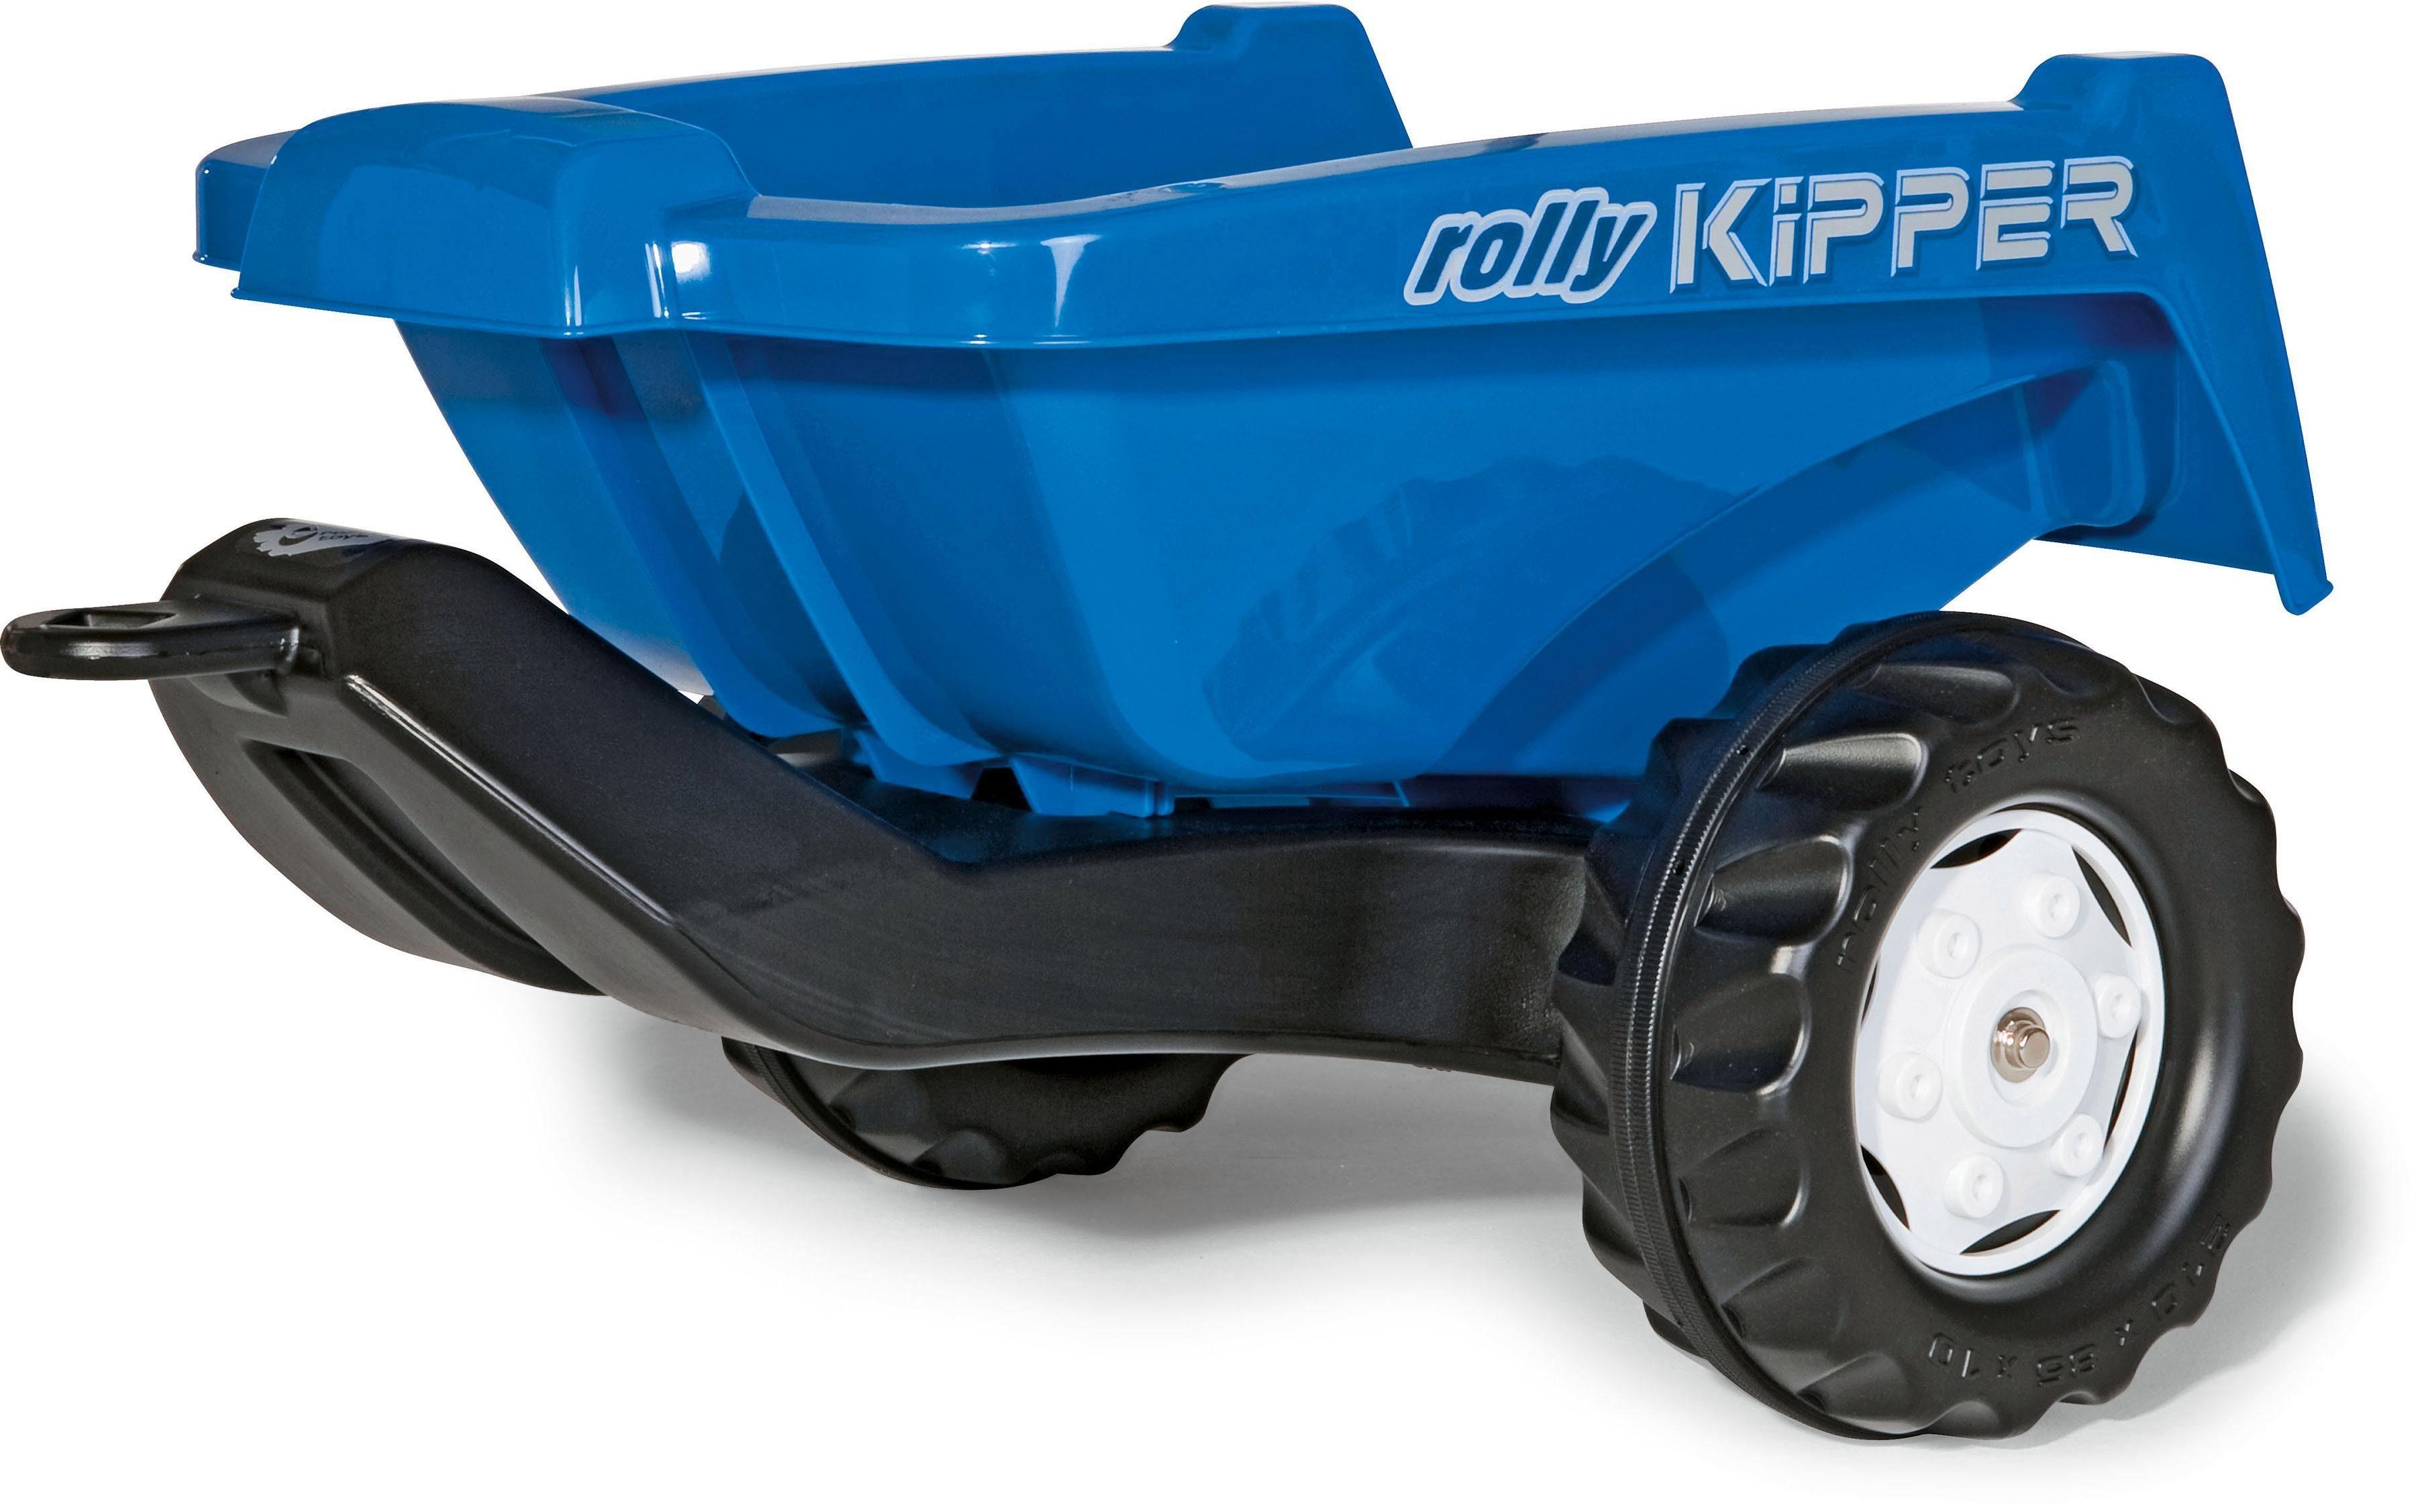 rolly® toys Anhänger für Trettraktor, »Kipper II, blau«